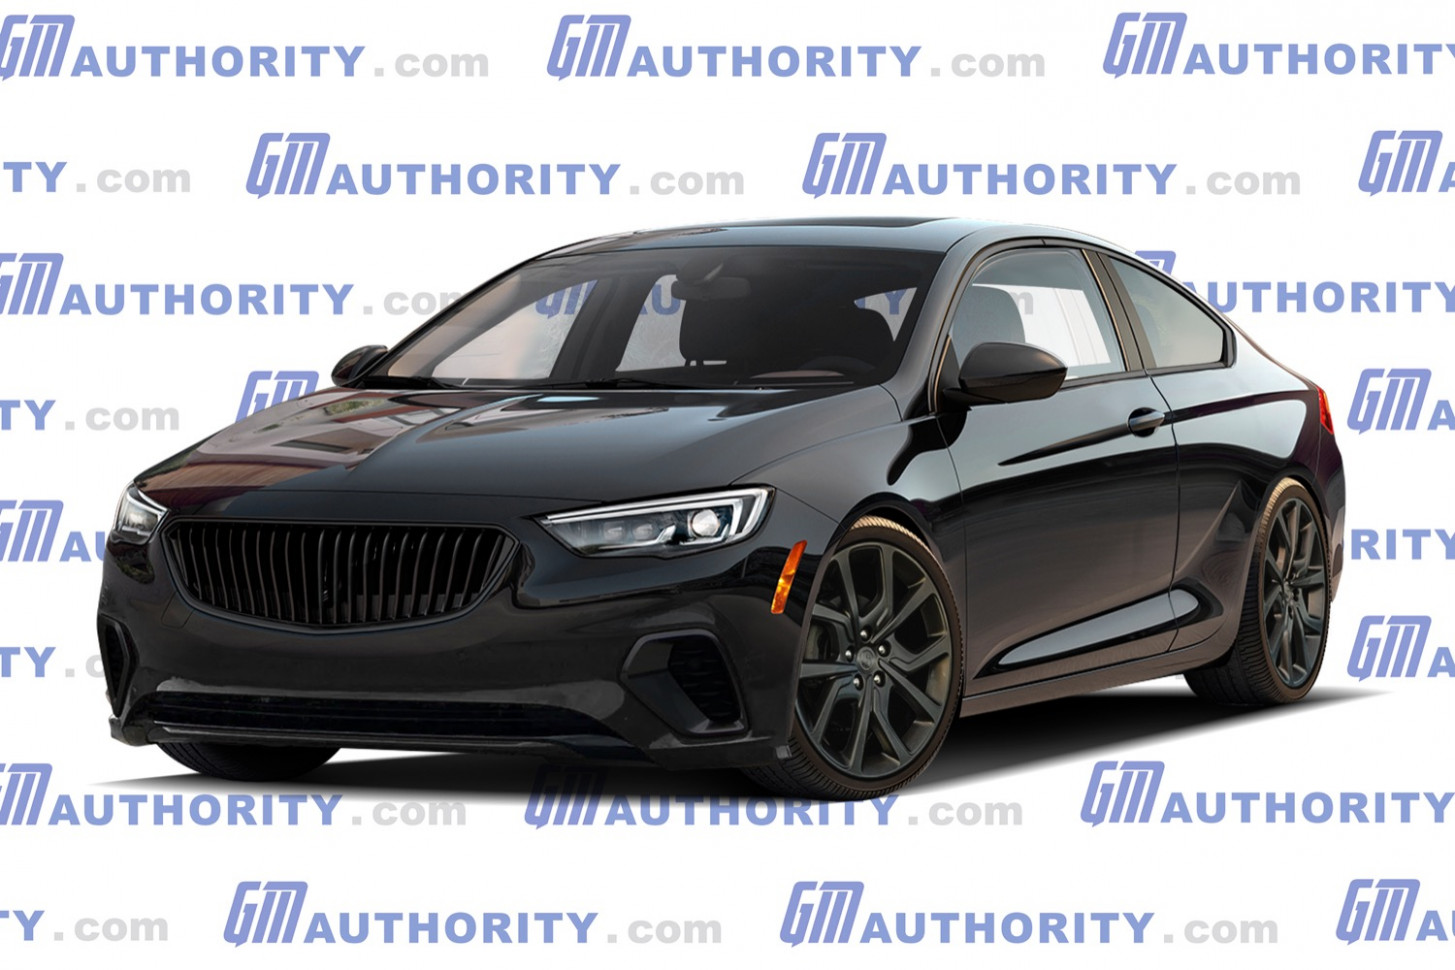 Specs 2022 Buick Regal Gs Coupe